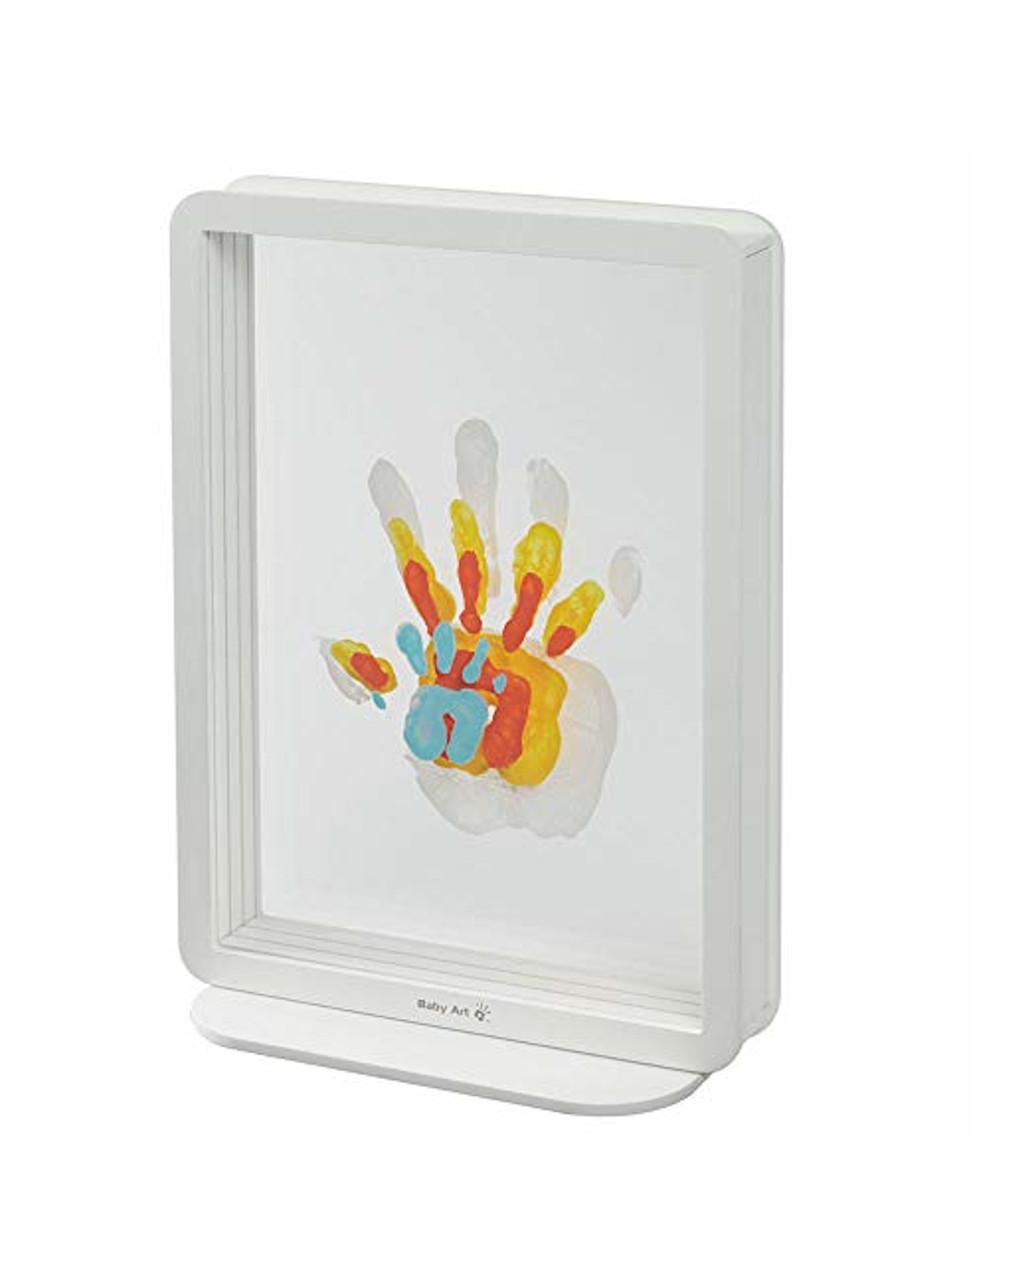 Baby art family touch - Baby Art